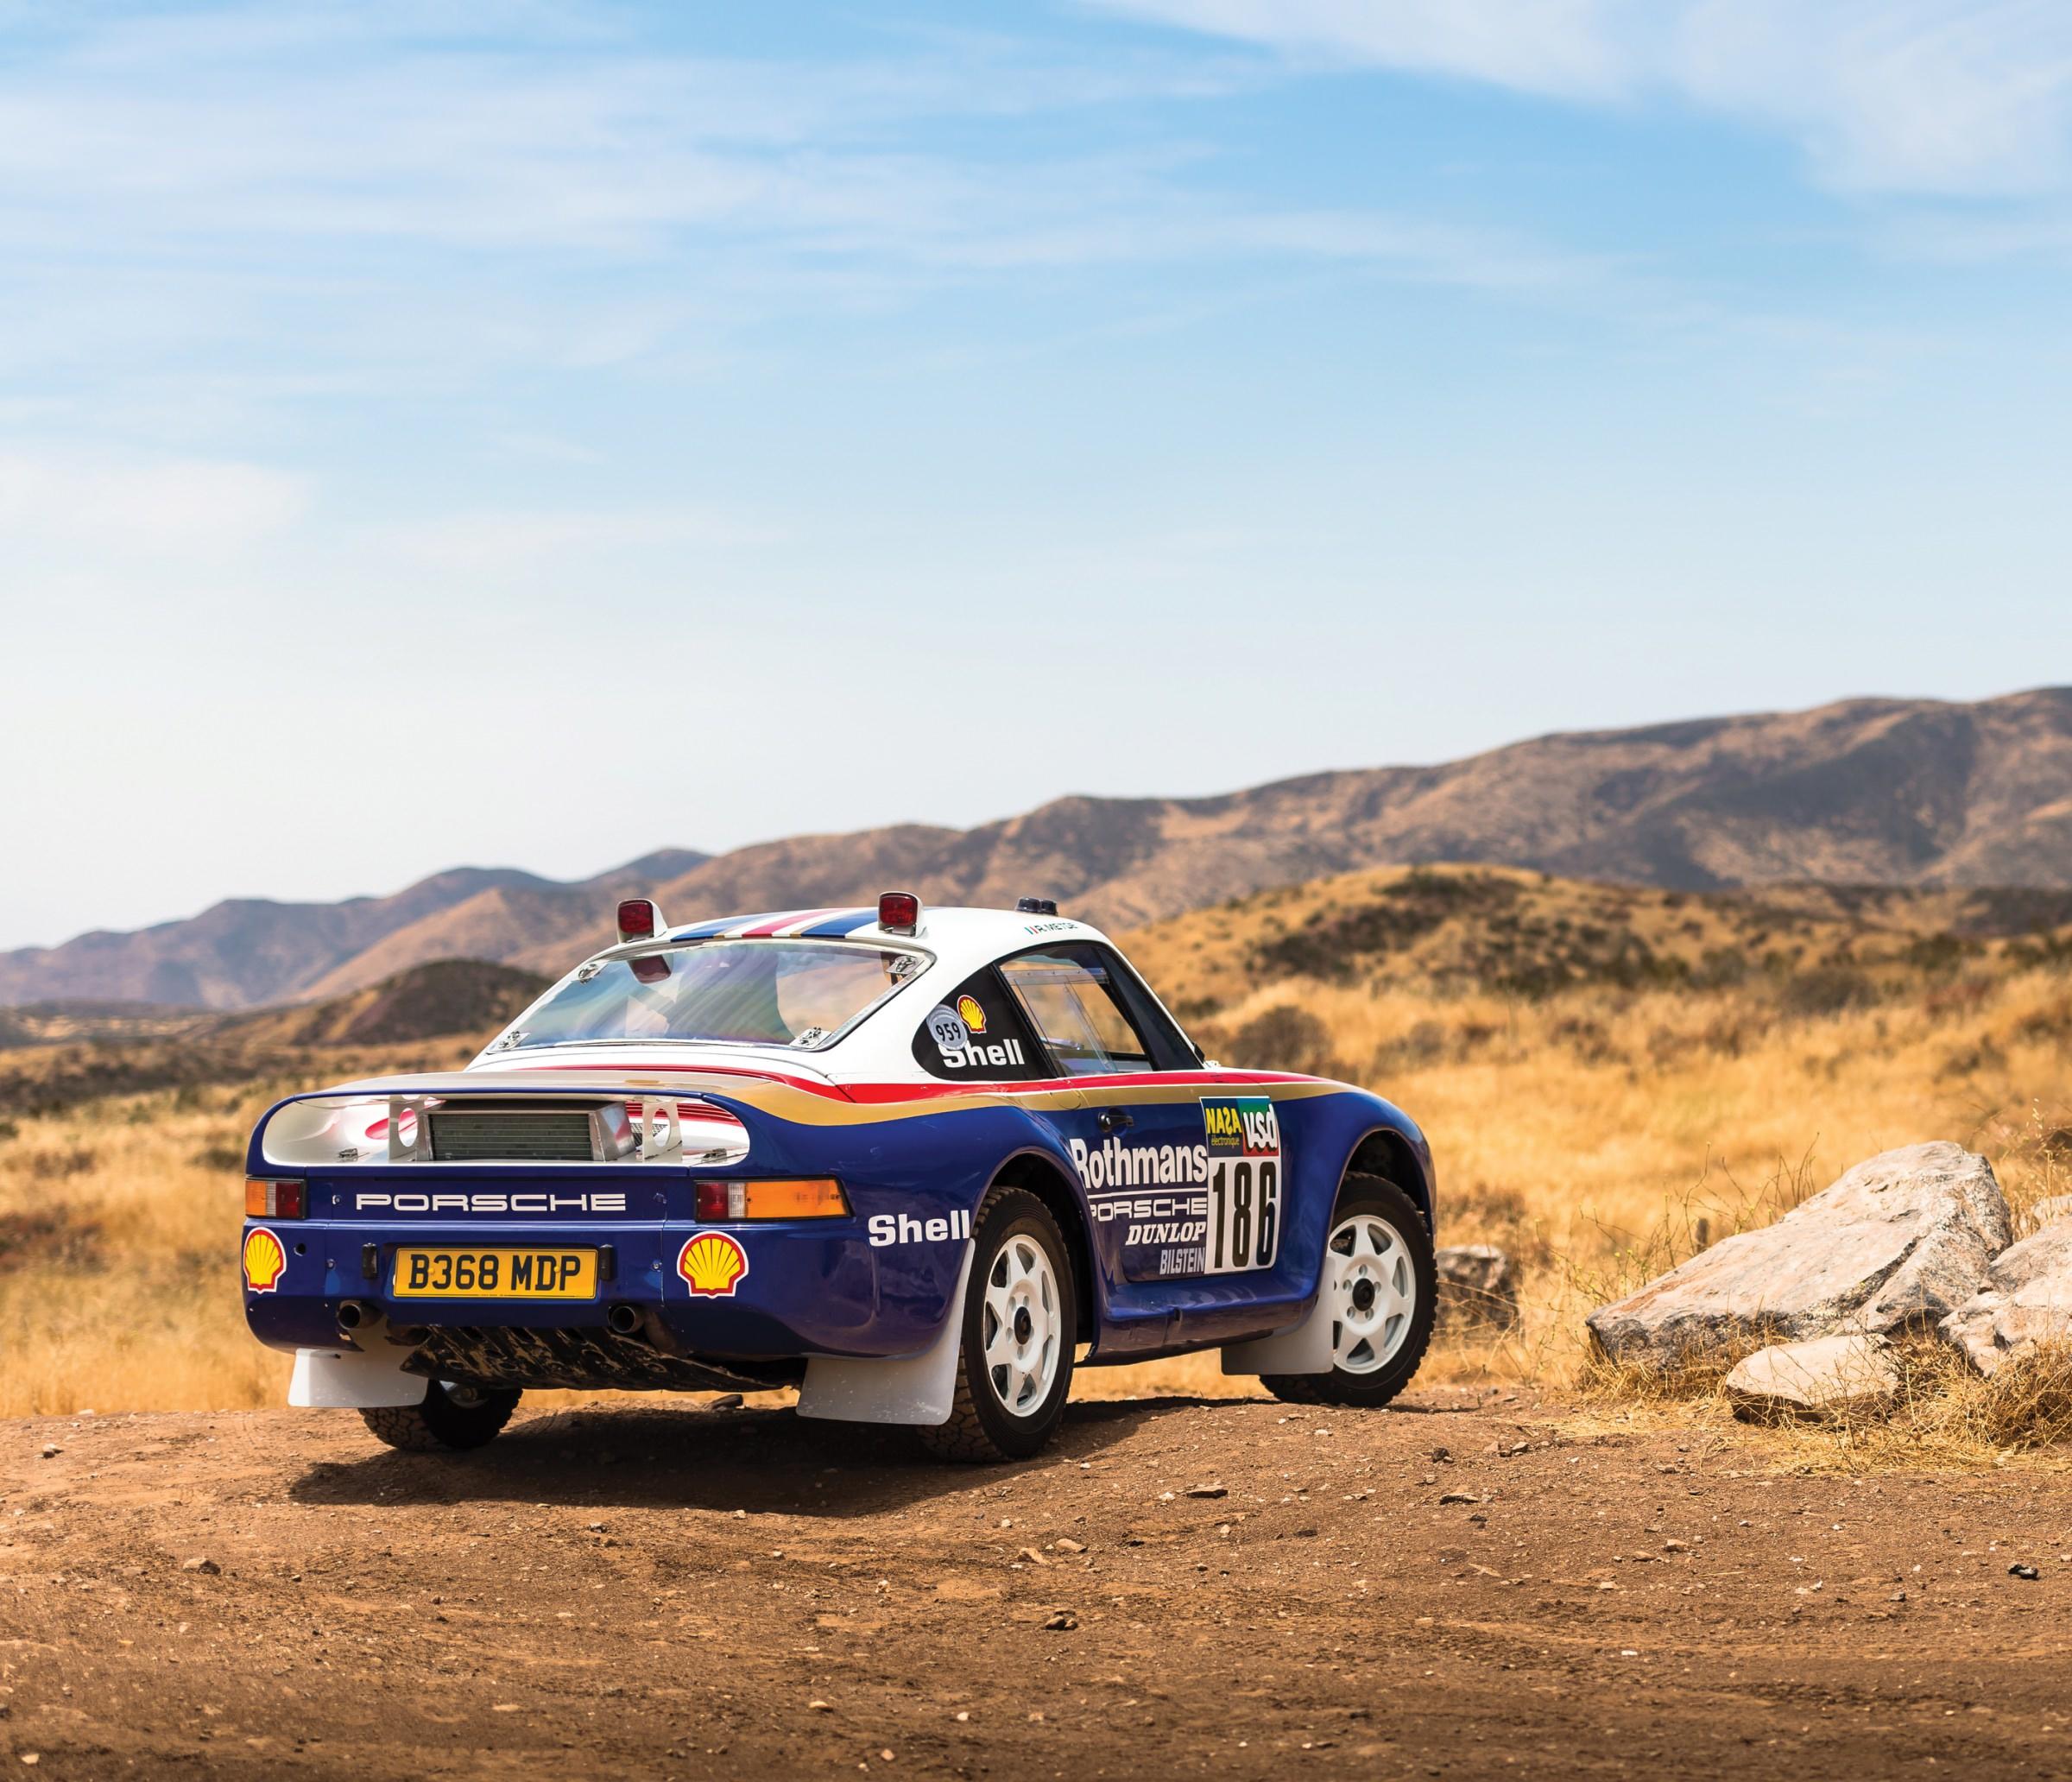 Porsche 959 For Sale >> The German Rally Unicorn: An Original Porsche 959 Paris ...